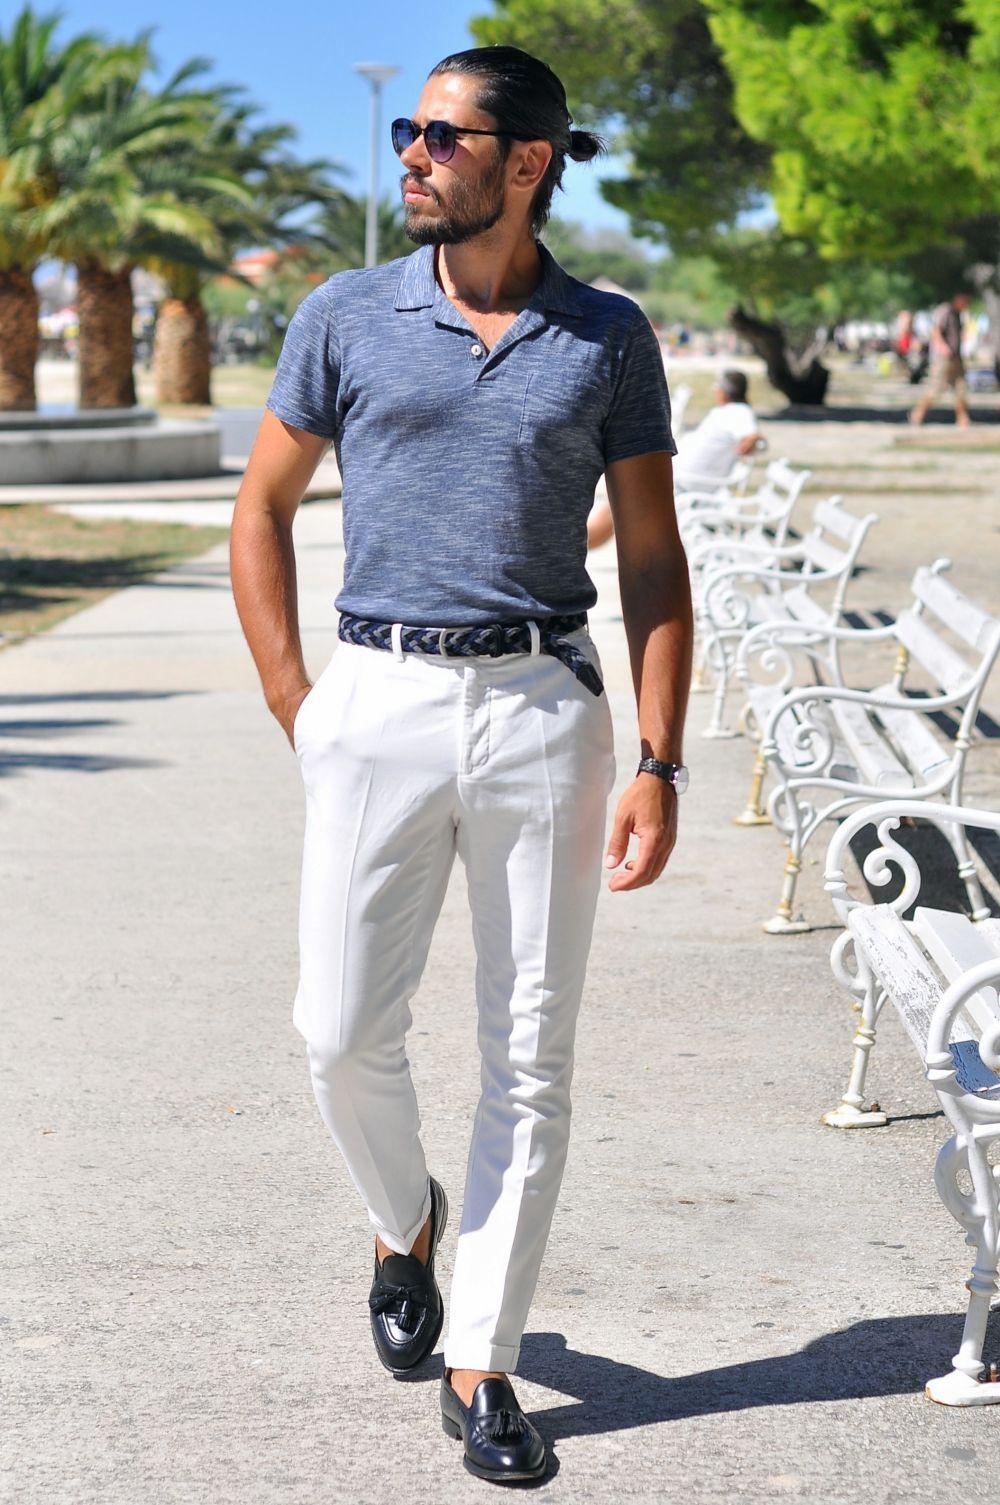 Niebieskie Polo I Biale Spodnie Outdersen Meska Moda I Styl Mens Tops Mens Tshirts T Shirt